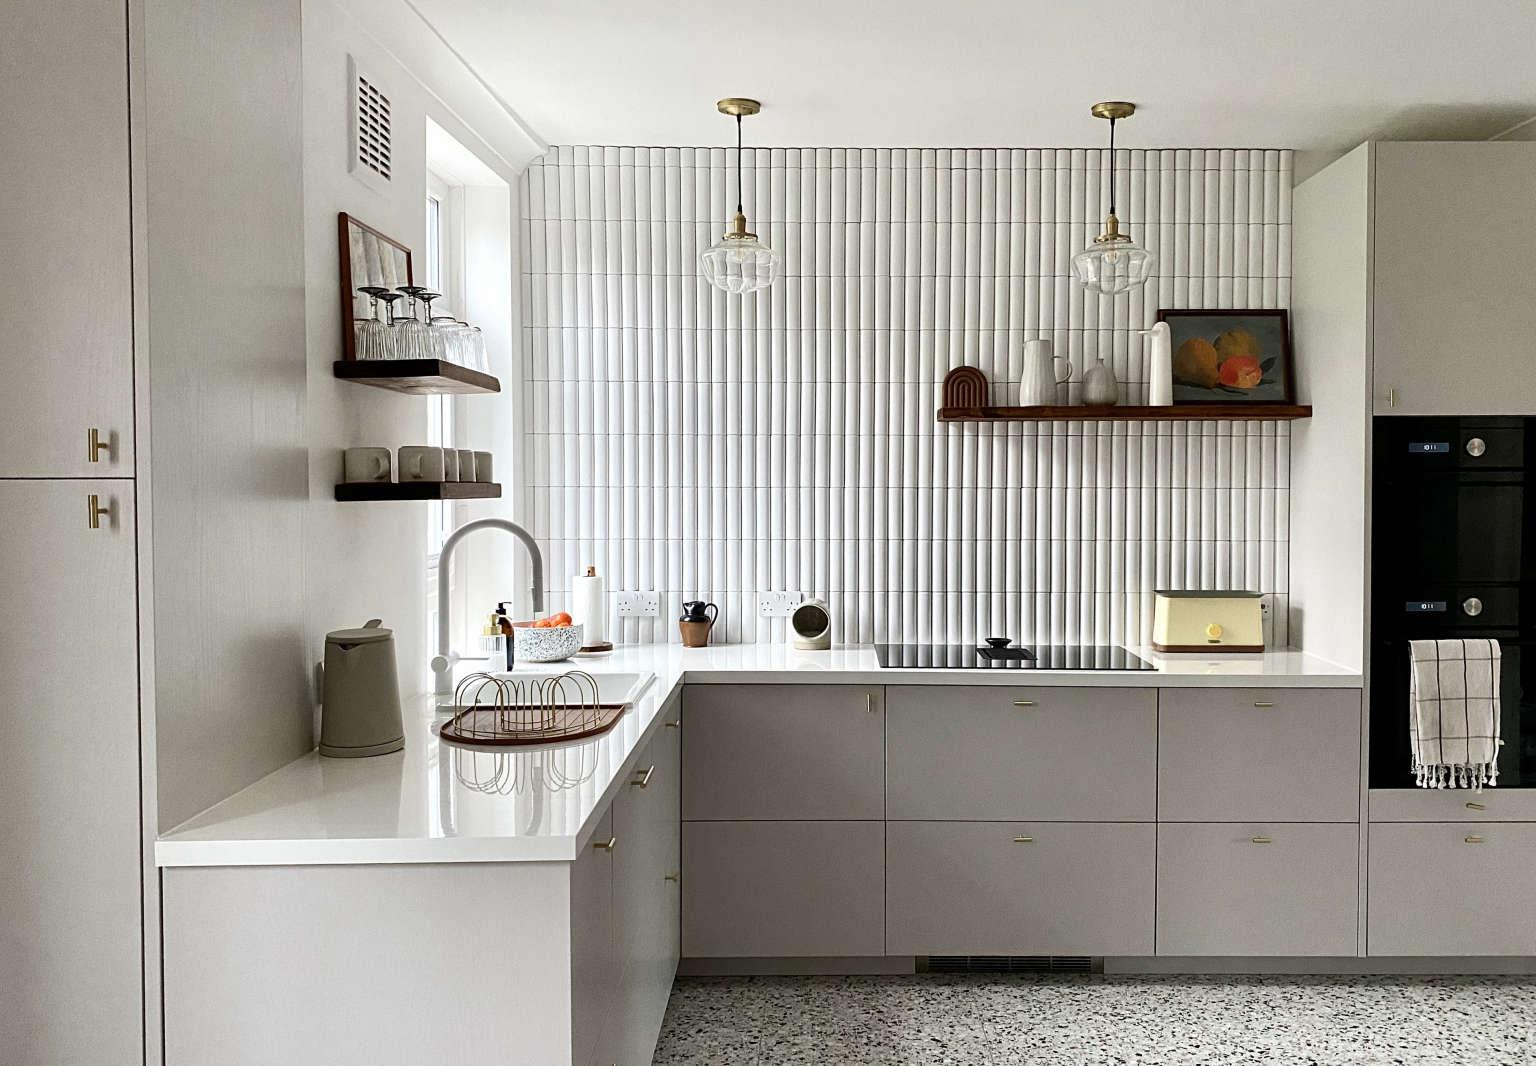 ferren gipson kitchen london 1